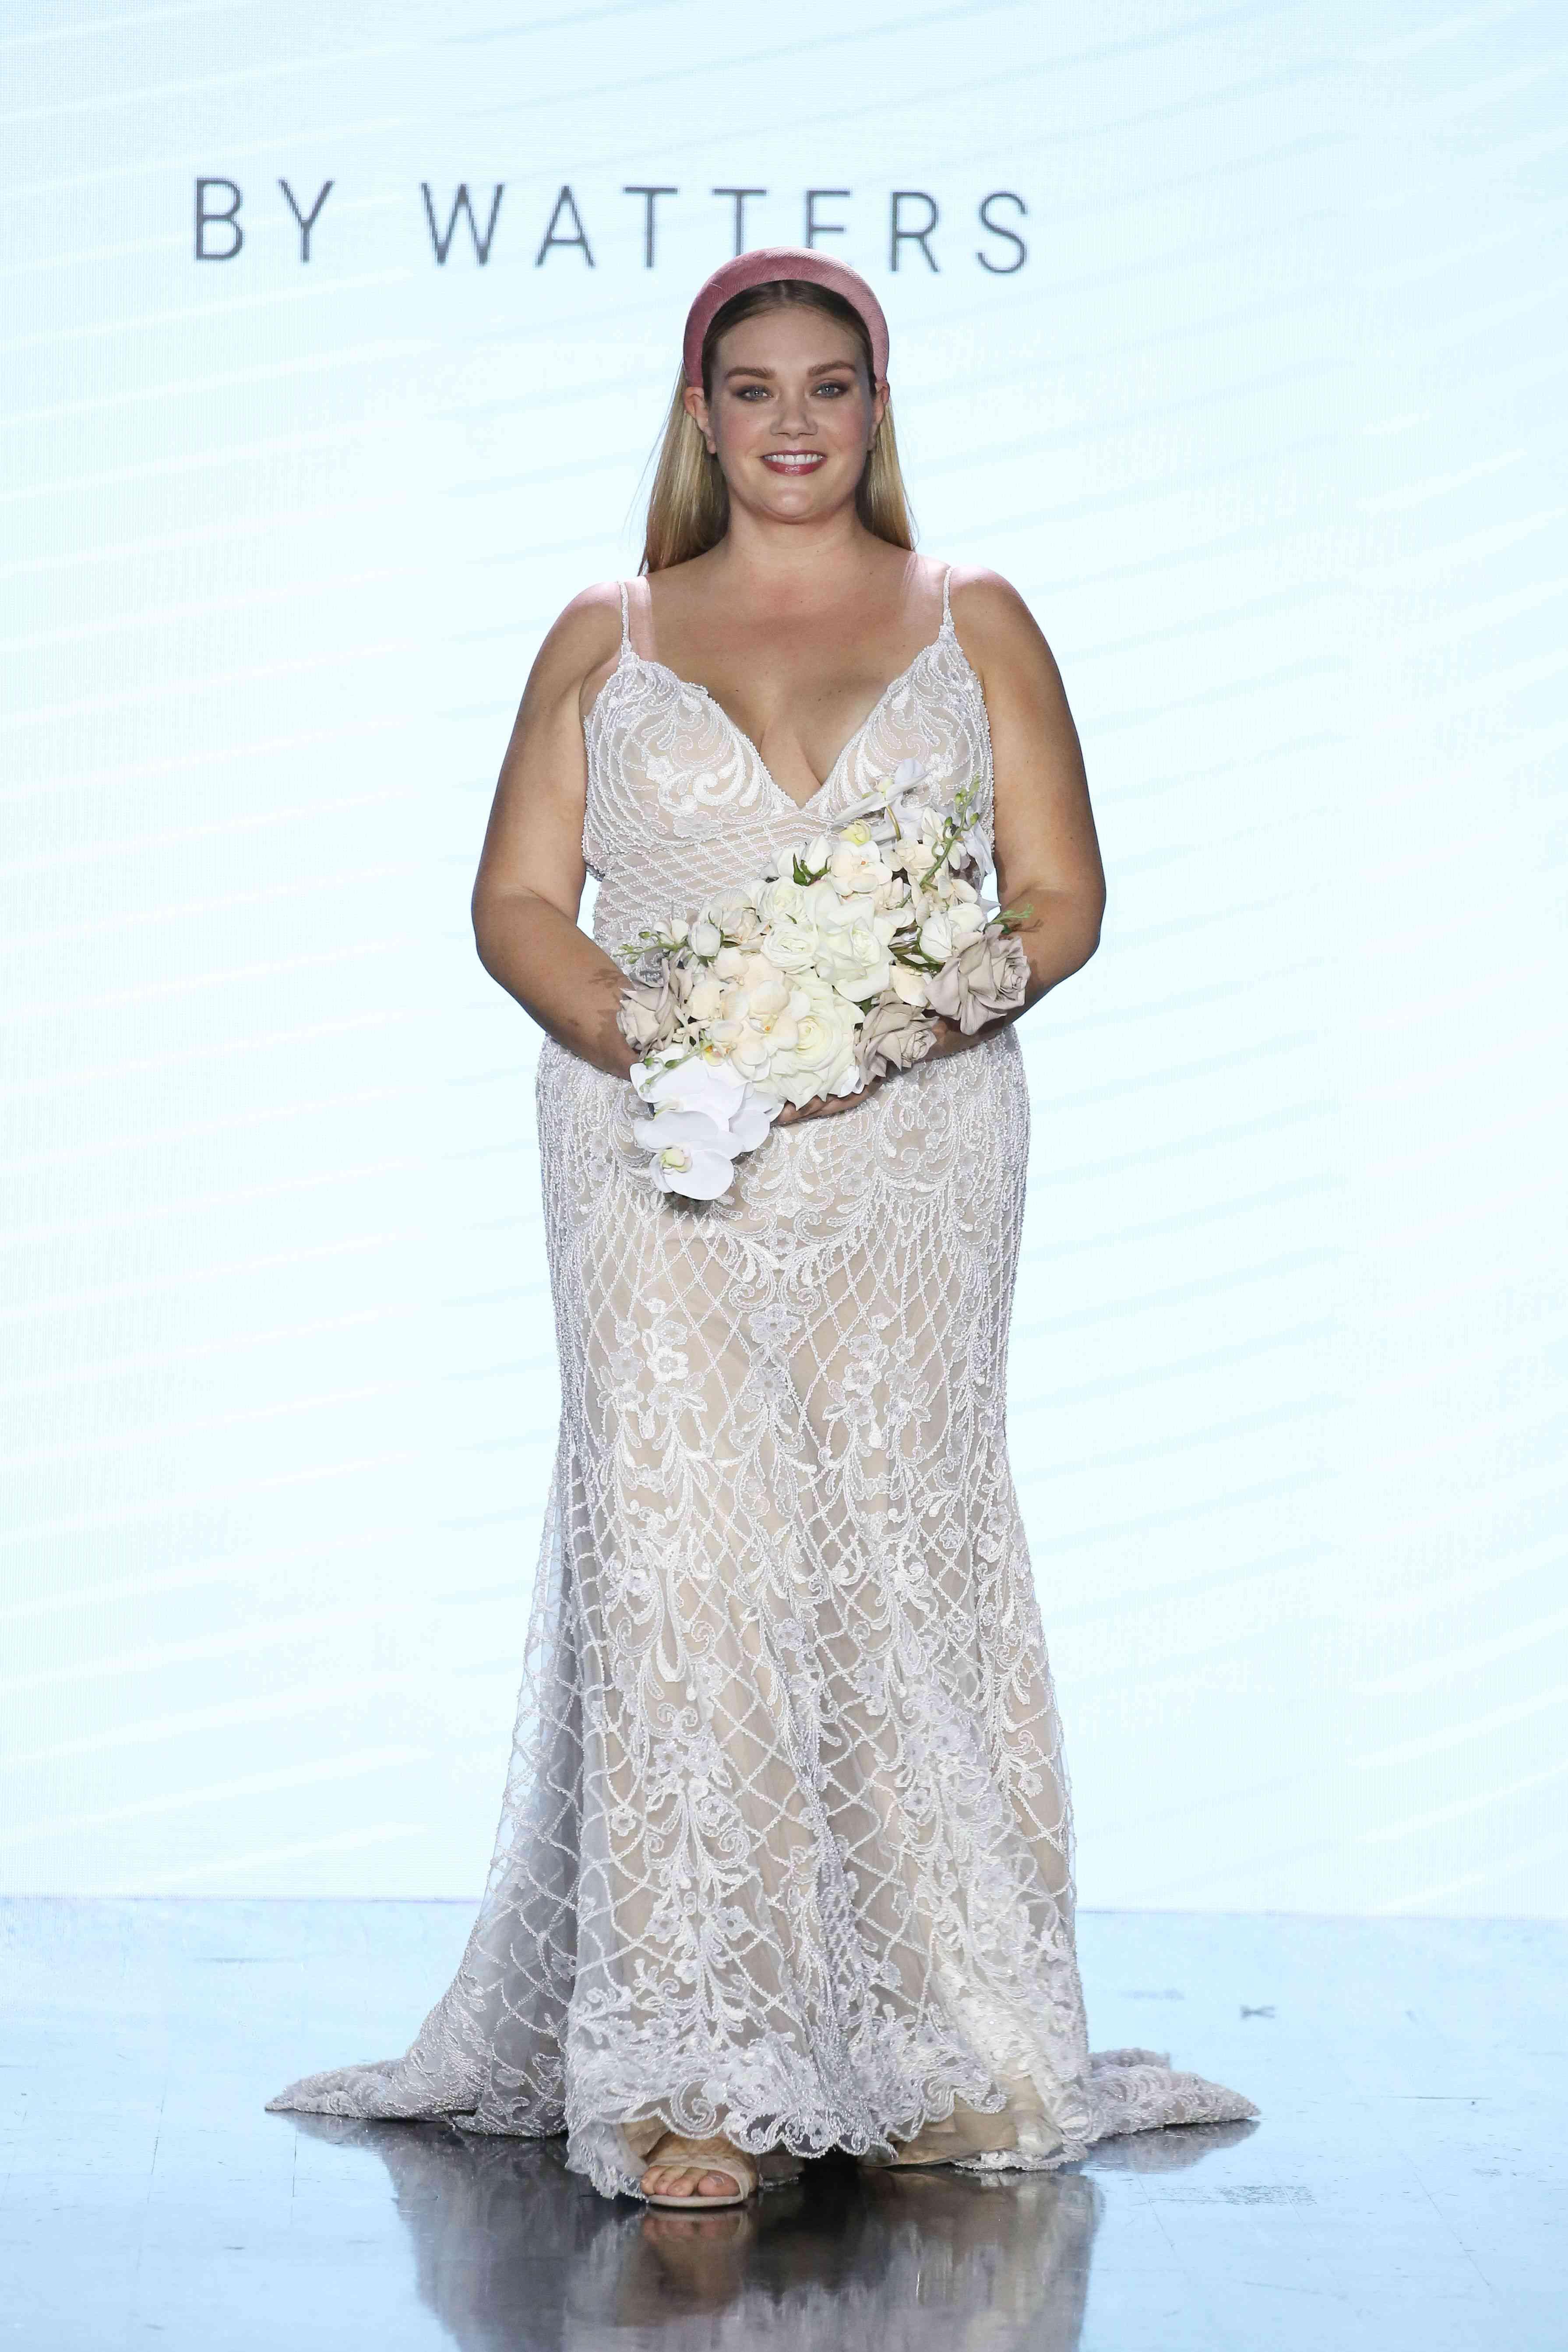 Model in V-neck wedding dress with allover floral beading